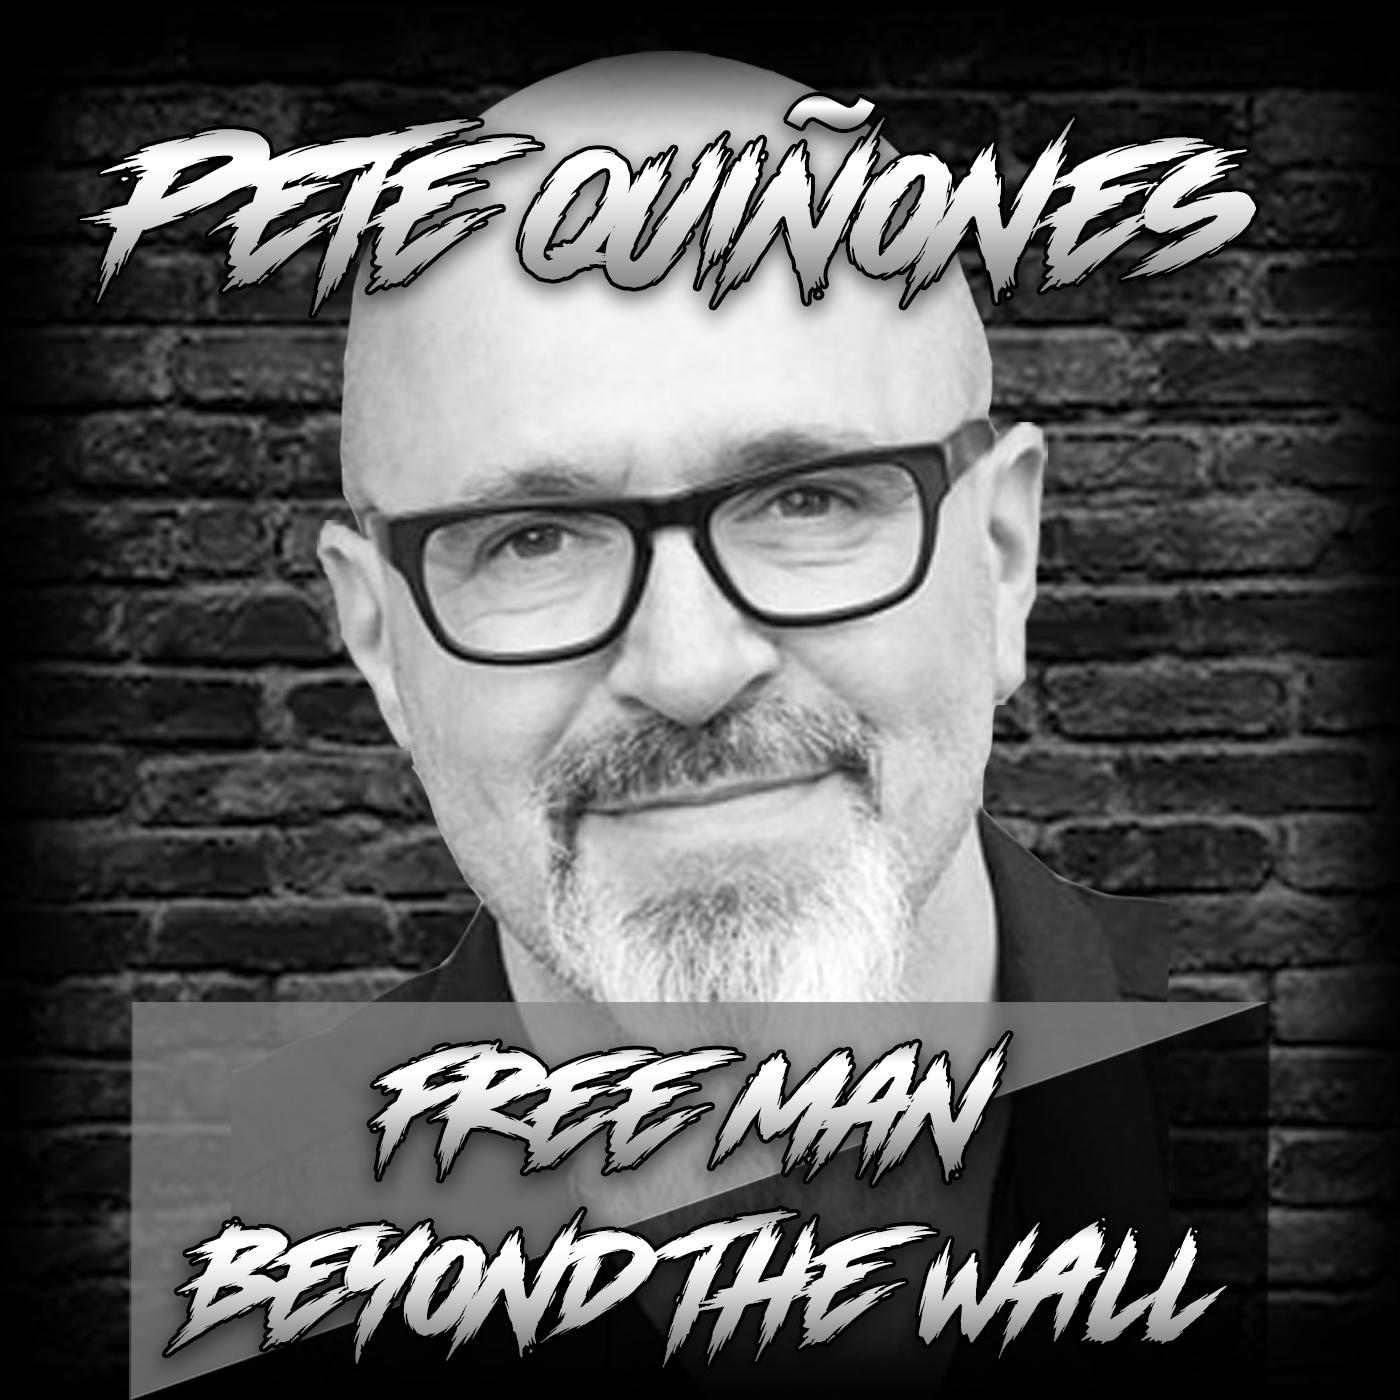 Free Man Beyond The Wall show art